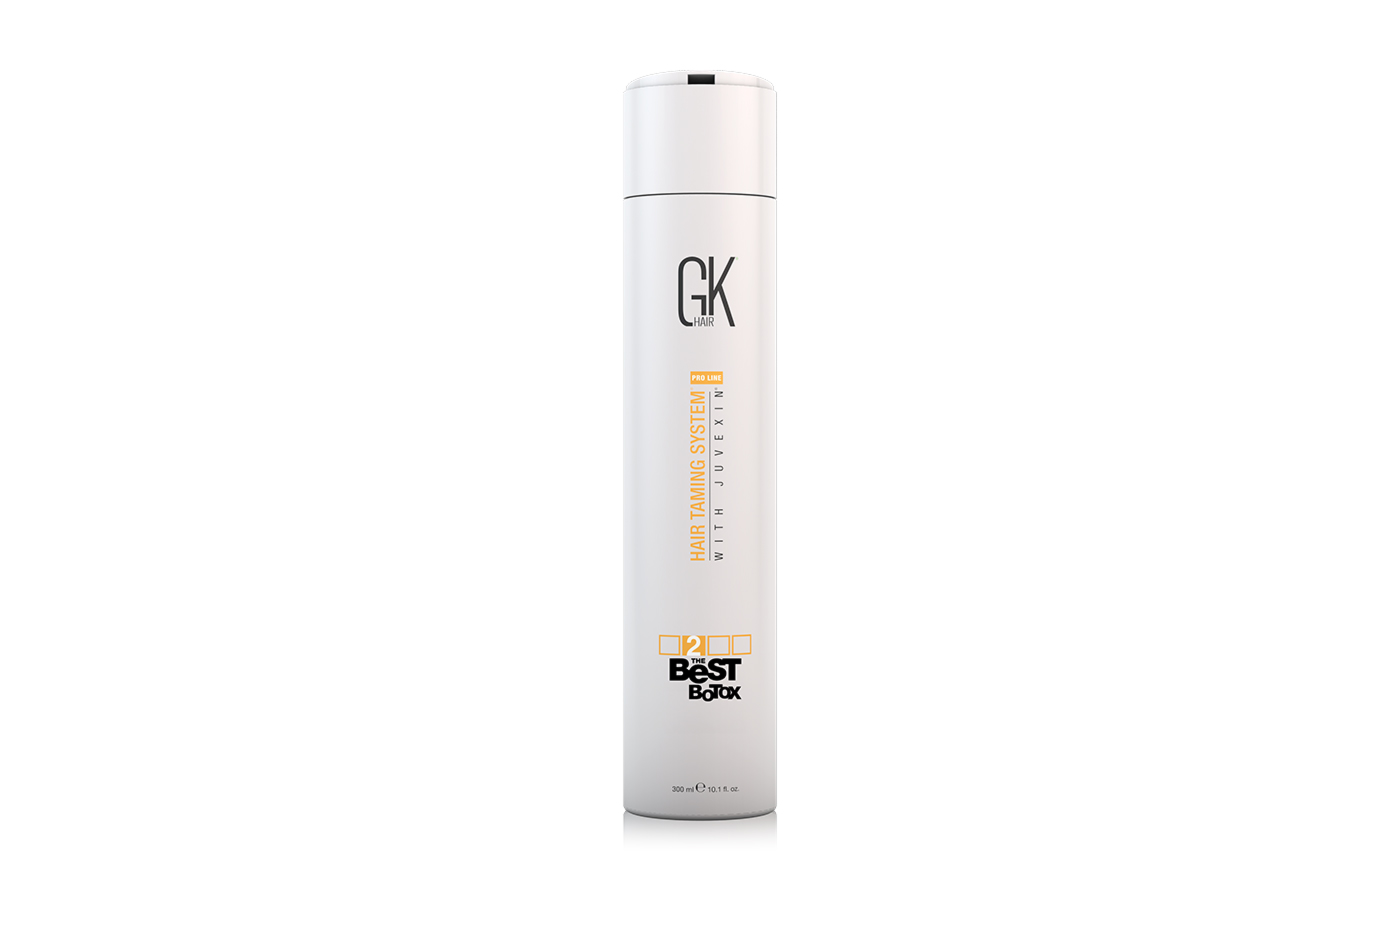 GK Hair unveils revolutionary hair treatment